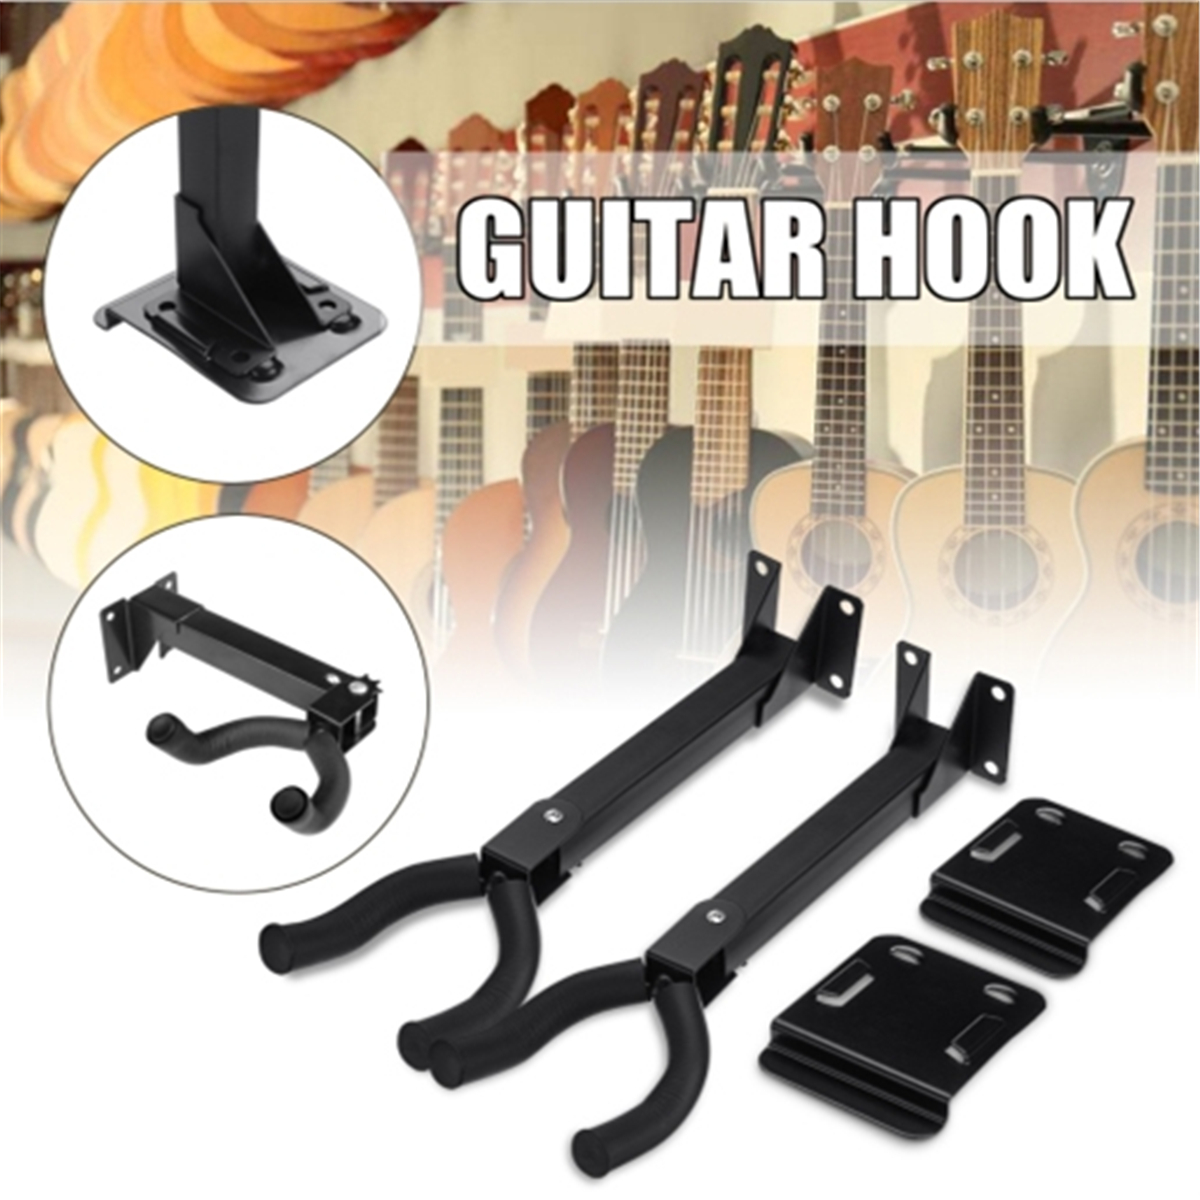 2pcs black guitar stand holder hook wall mount stand rack guitar groove hook horizontal fit most. Black Bedroom Furniture Sets. Home Design Ideas